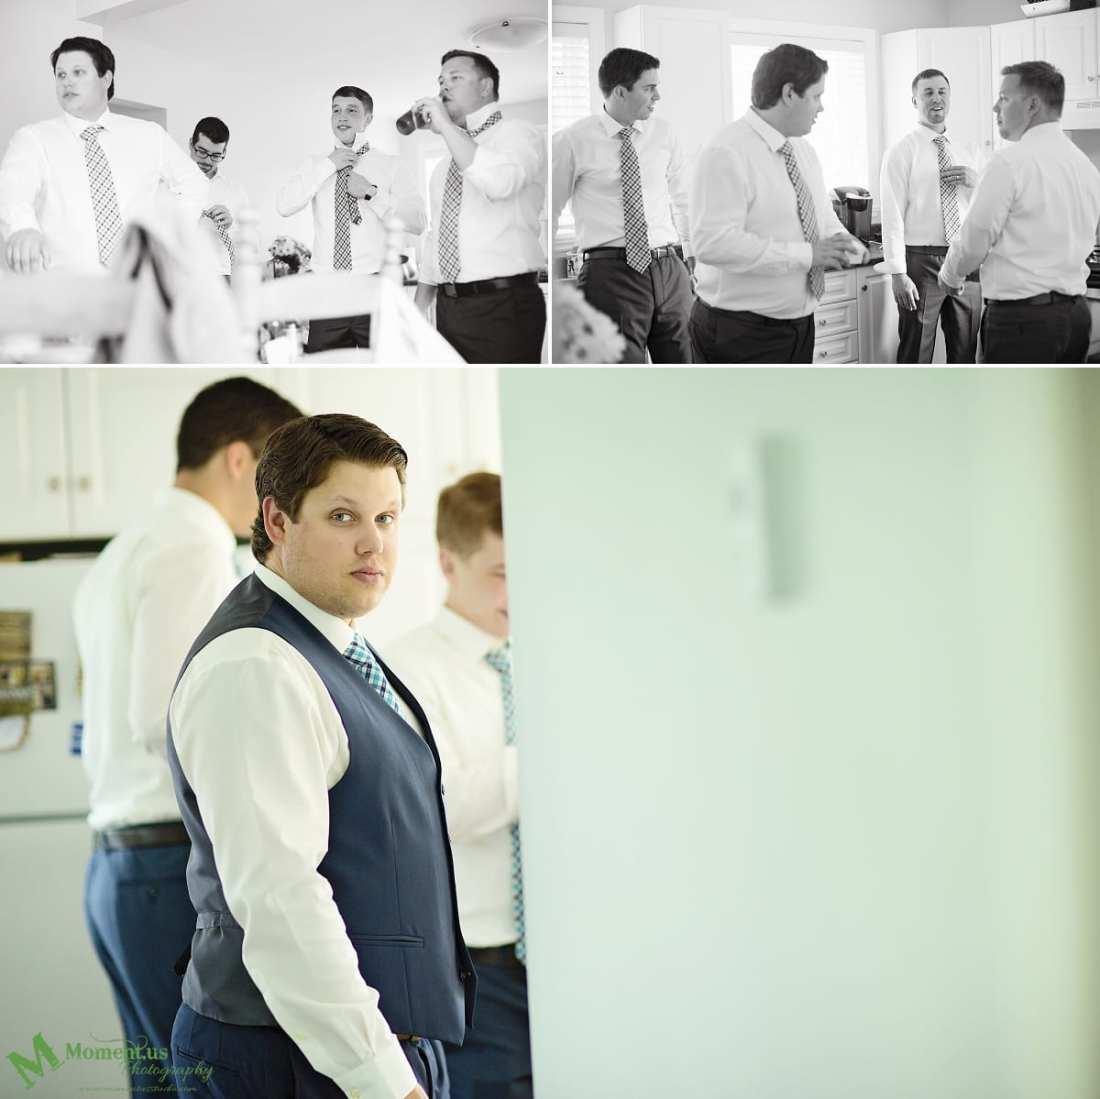 rustic country wedding photos - groom in waistcoat